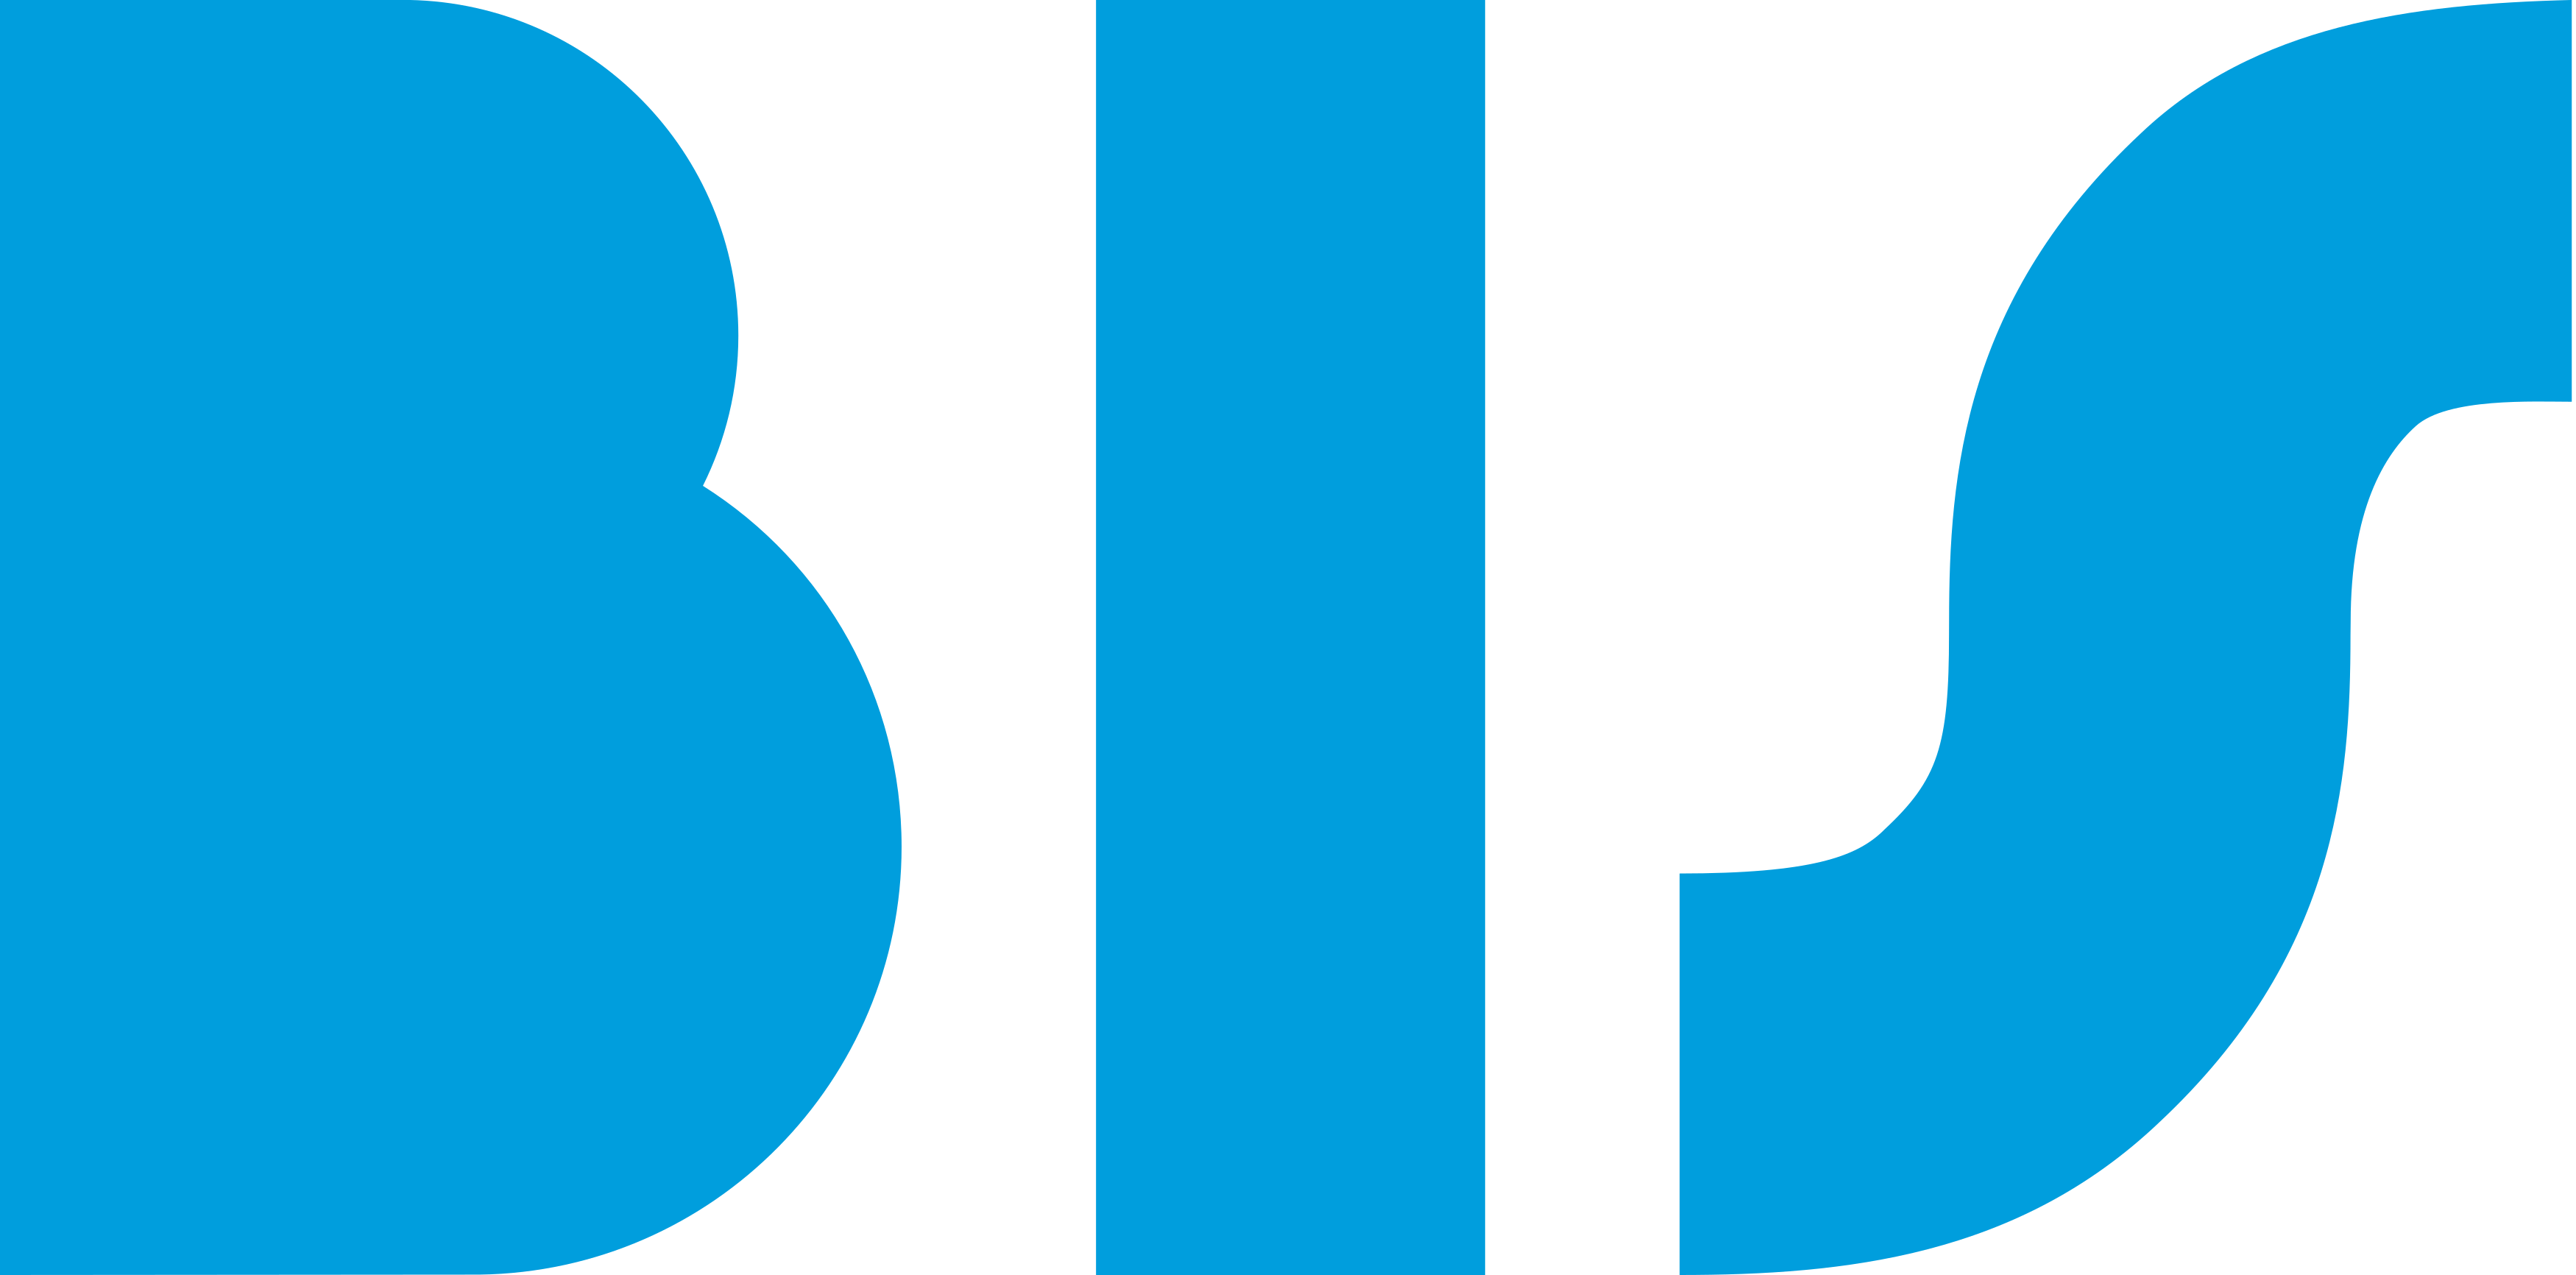 canal bis logo 1 - Canal Bis Logo